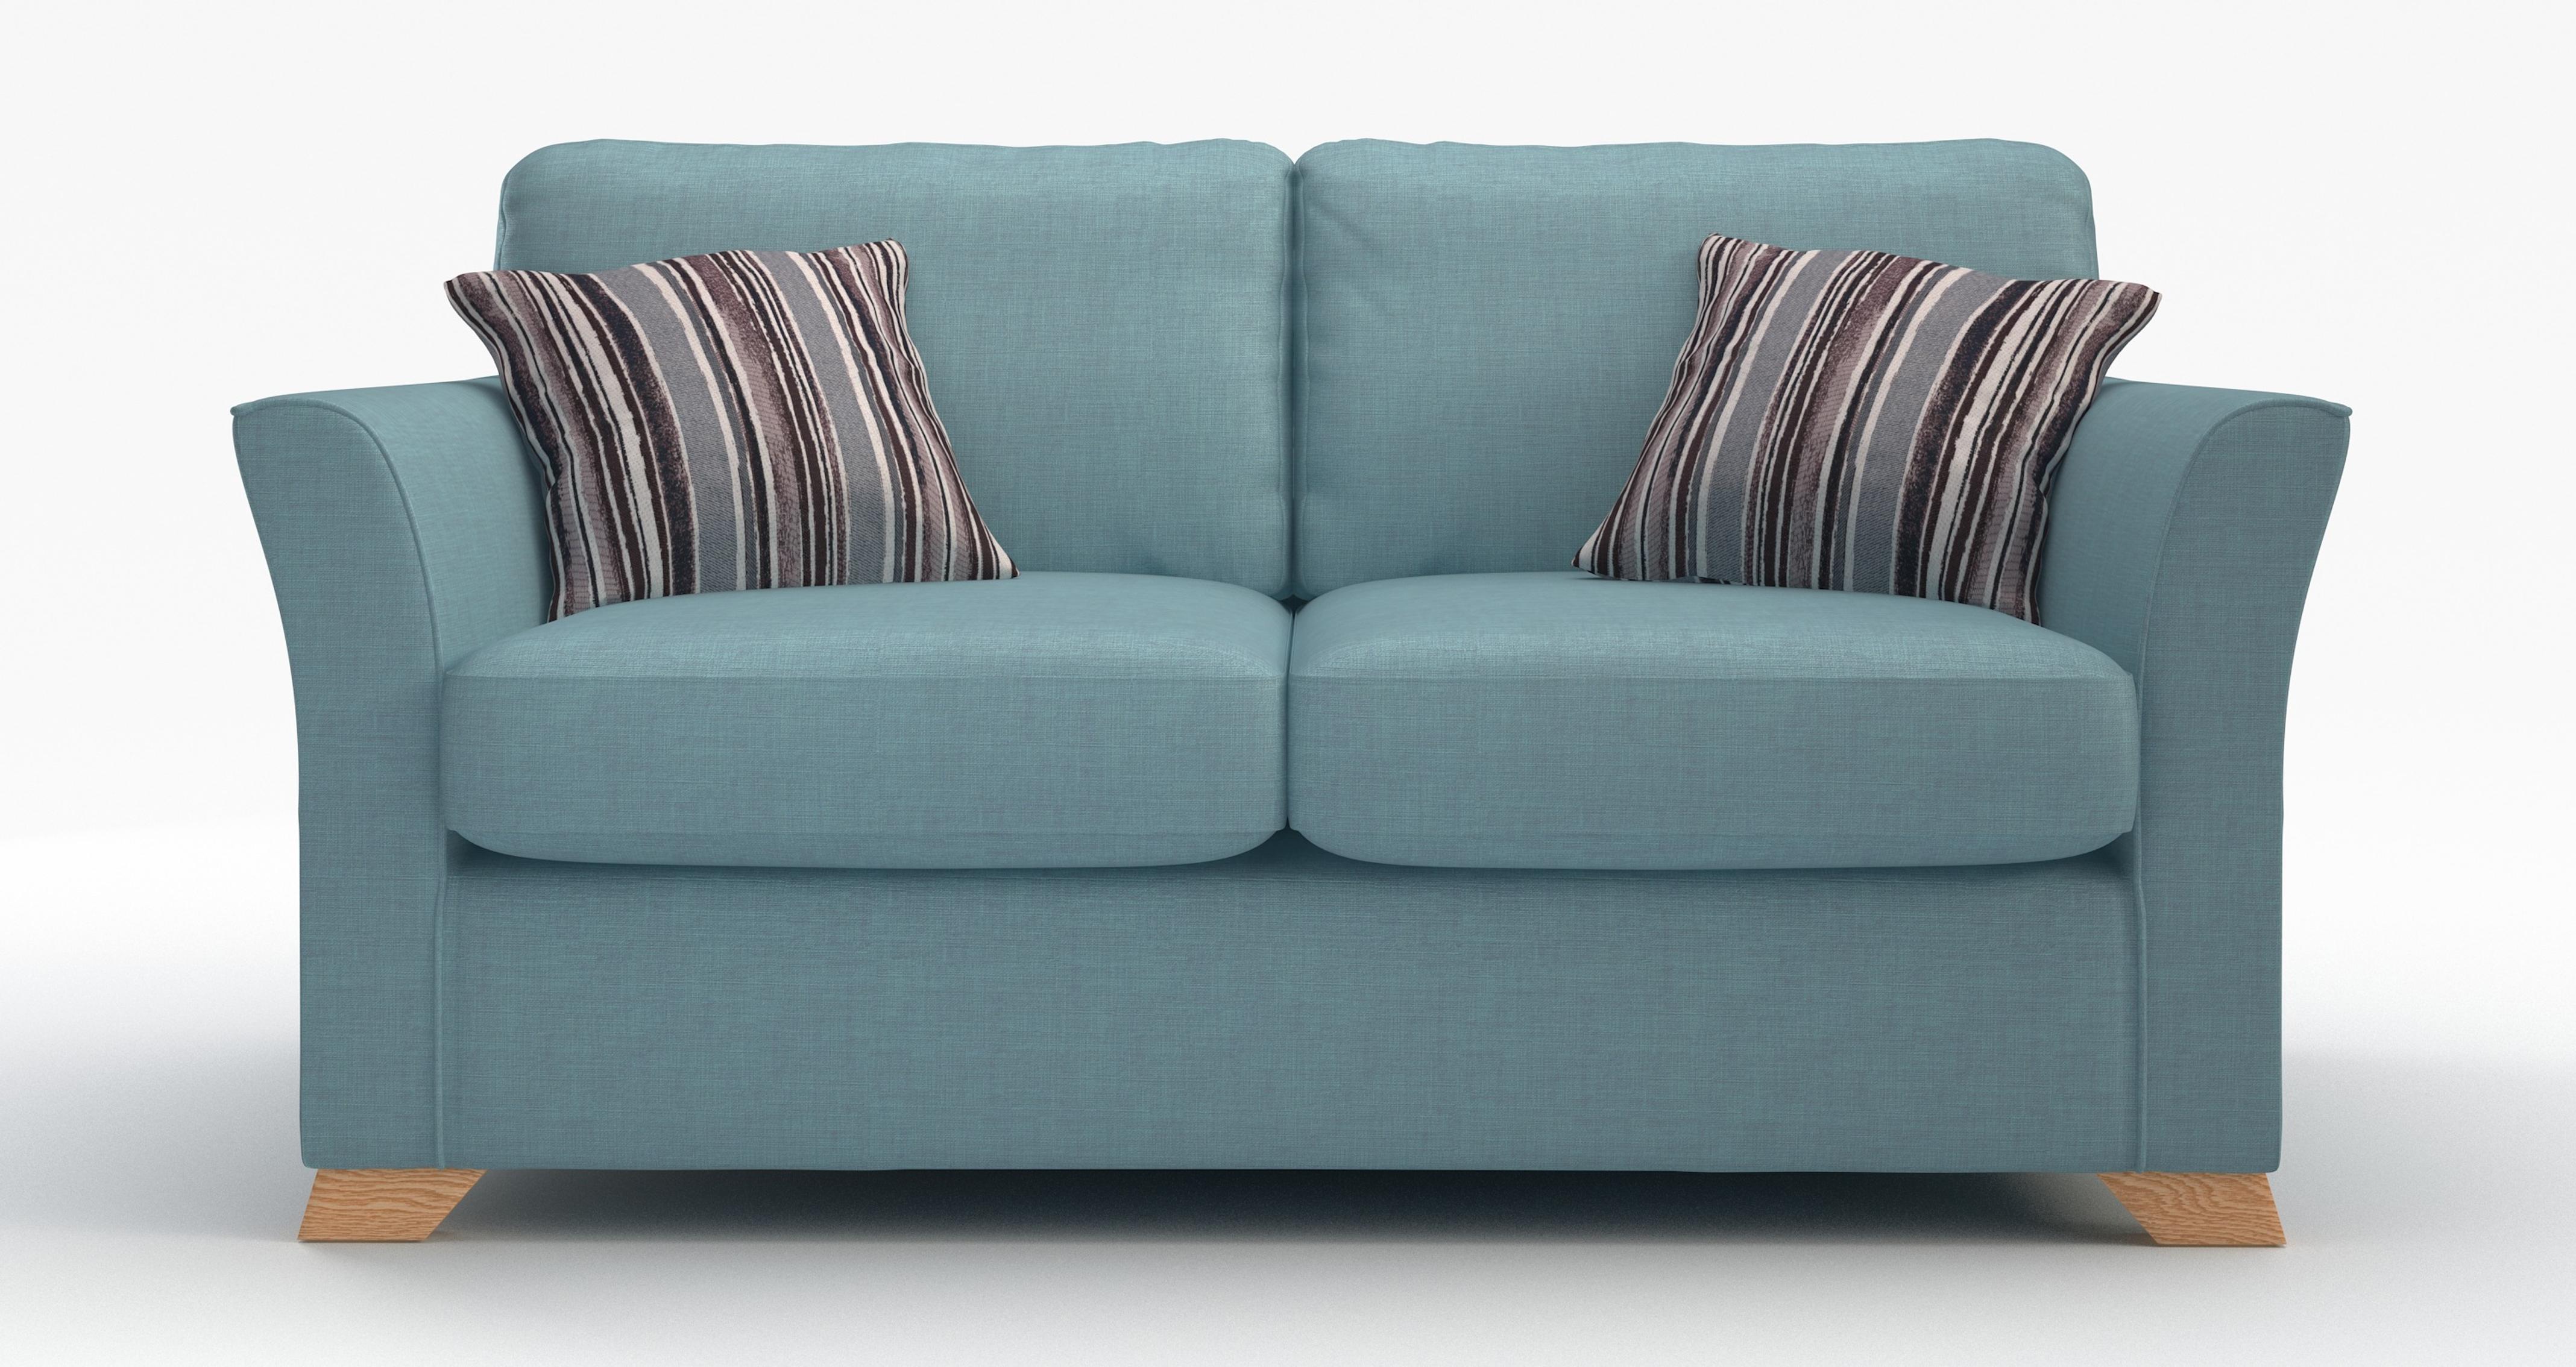 Dfs Zuma Sky Blue Fabric Range 3 Seater 2 Str Sofa Bed